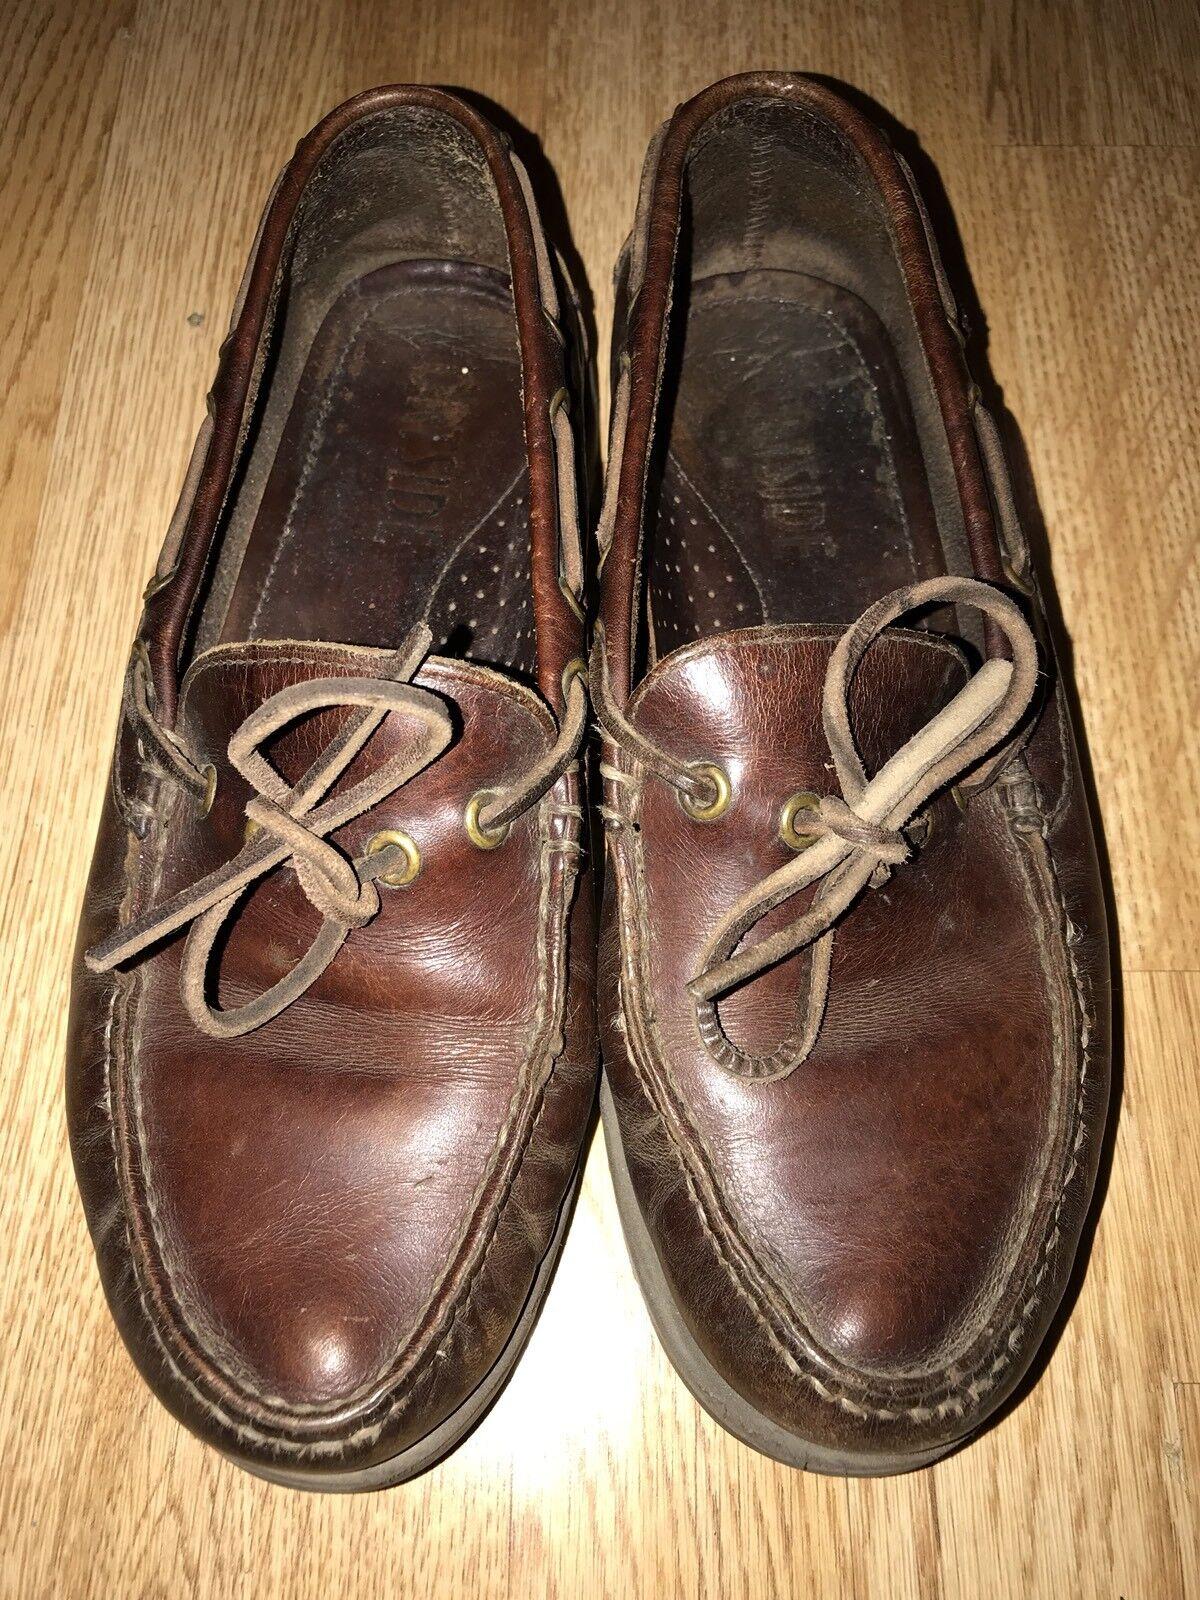 SHOES PORTSIDE SIZE  Leather MEN's BROWN SIZE PORTSIDE EU 014dcb